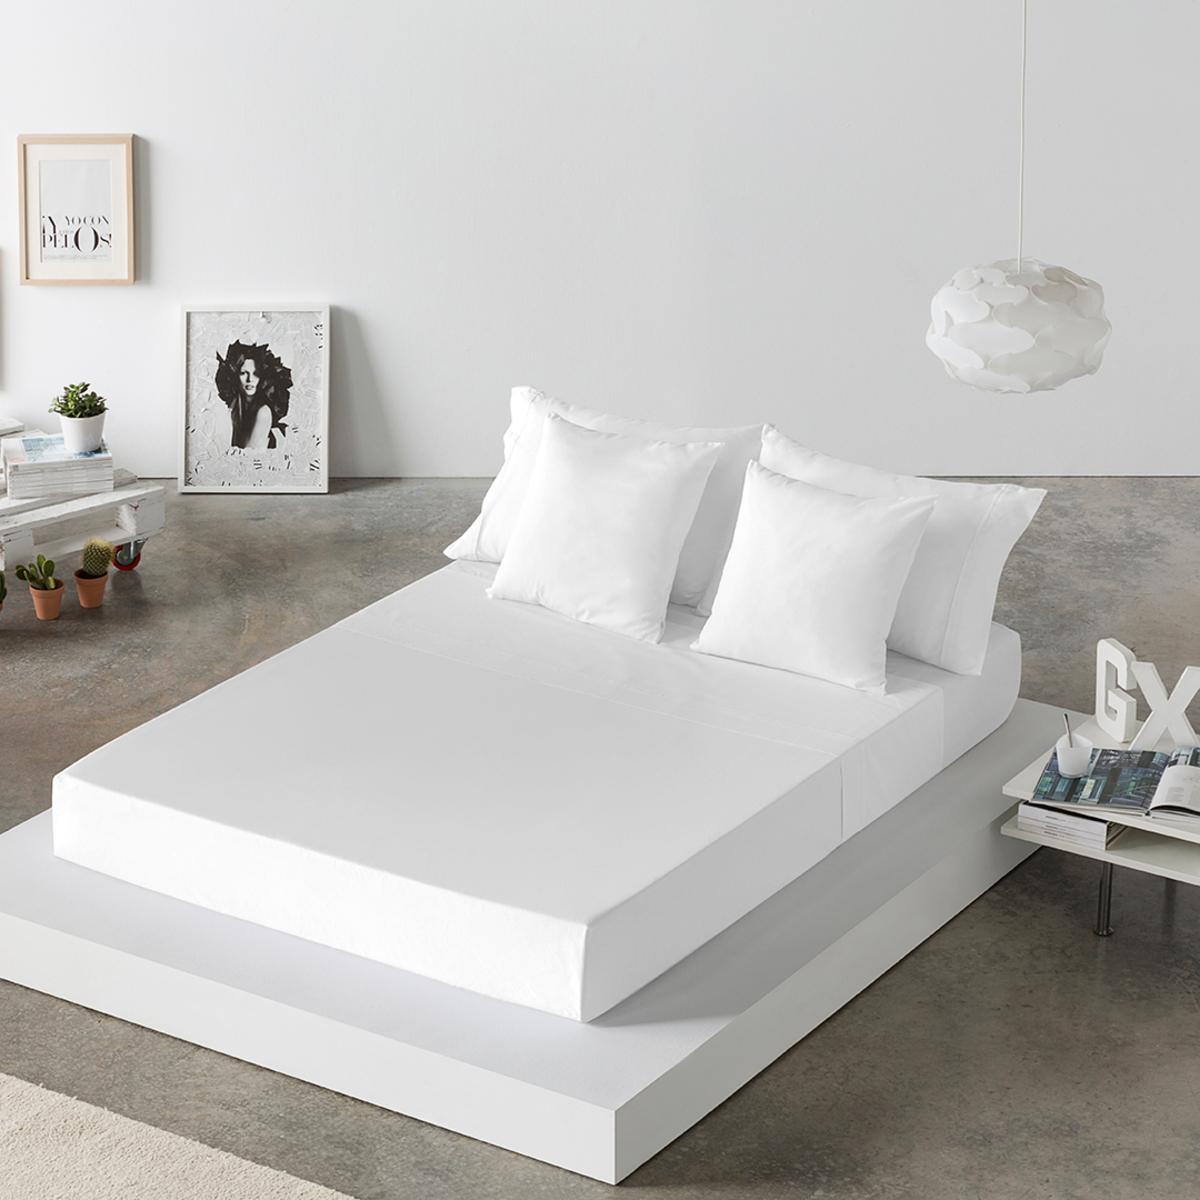 Drap de lit en coton blanc 250x280